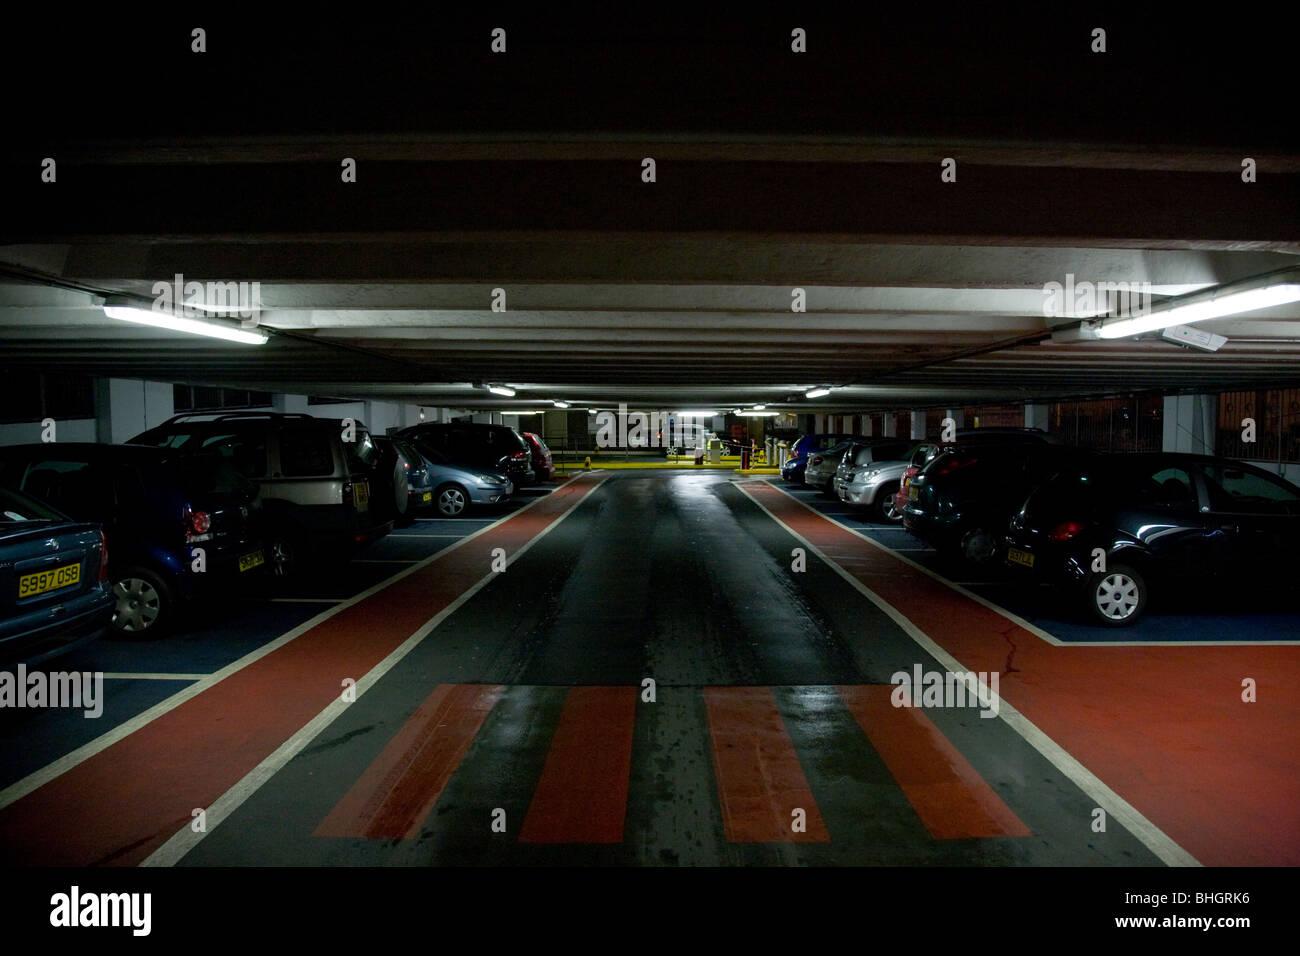 multistory car park - Stock Image